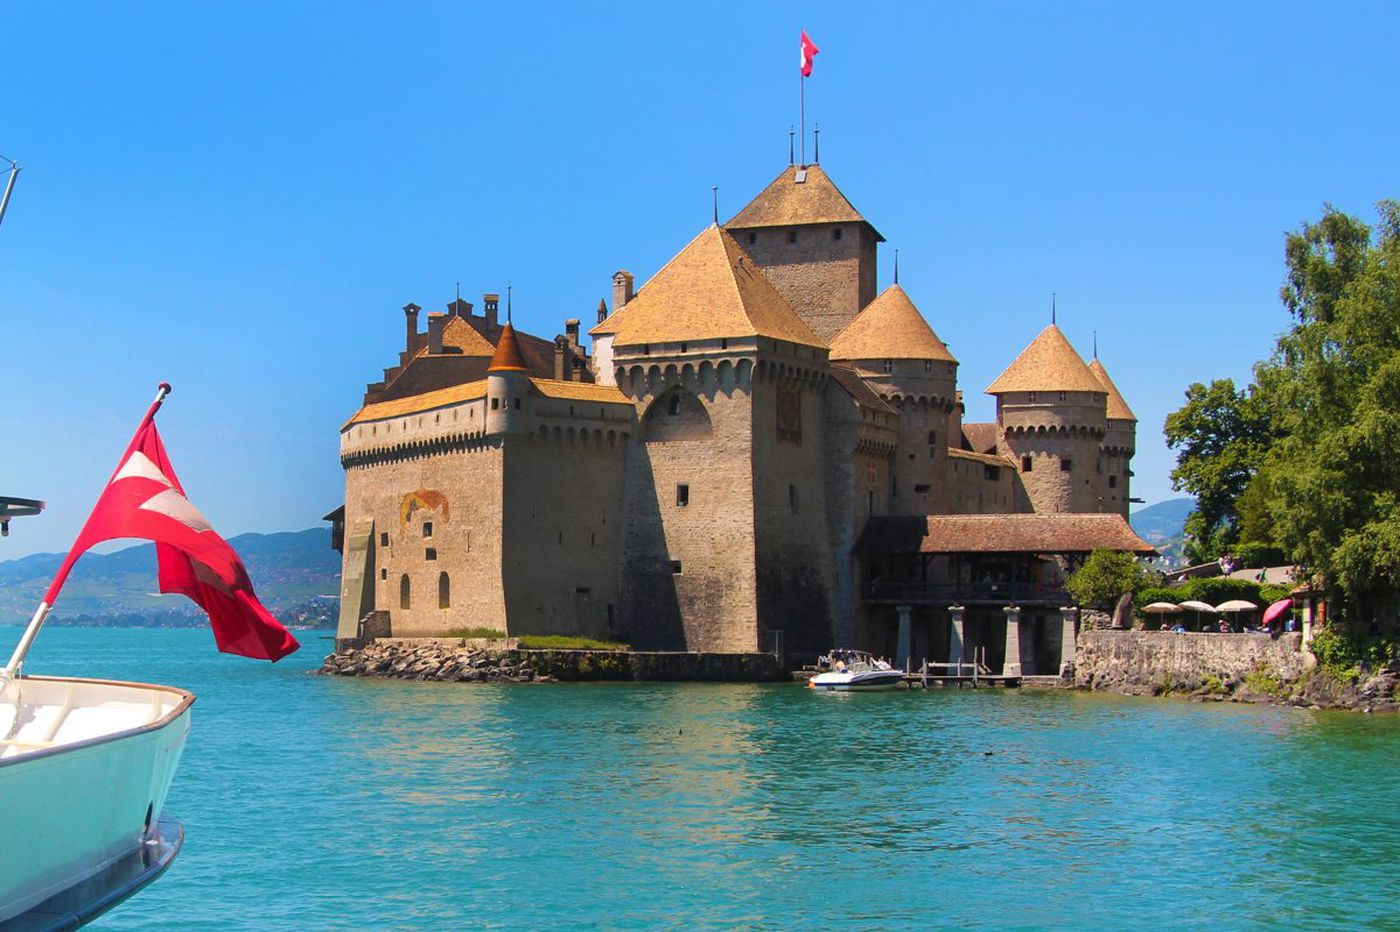 Lake Geneva is a Swiss paradise